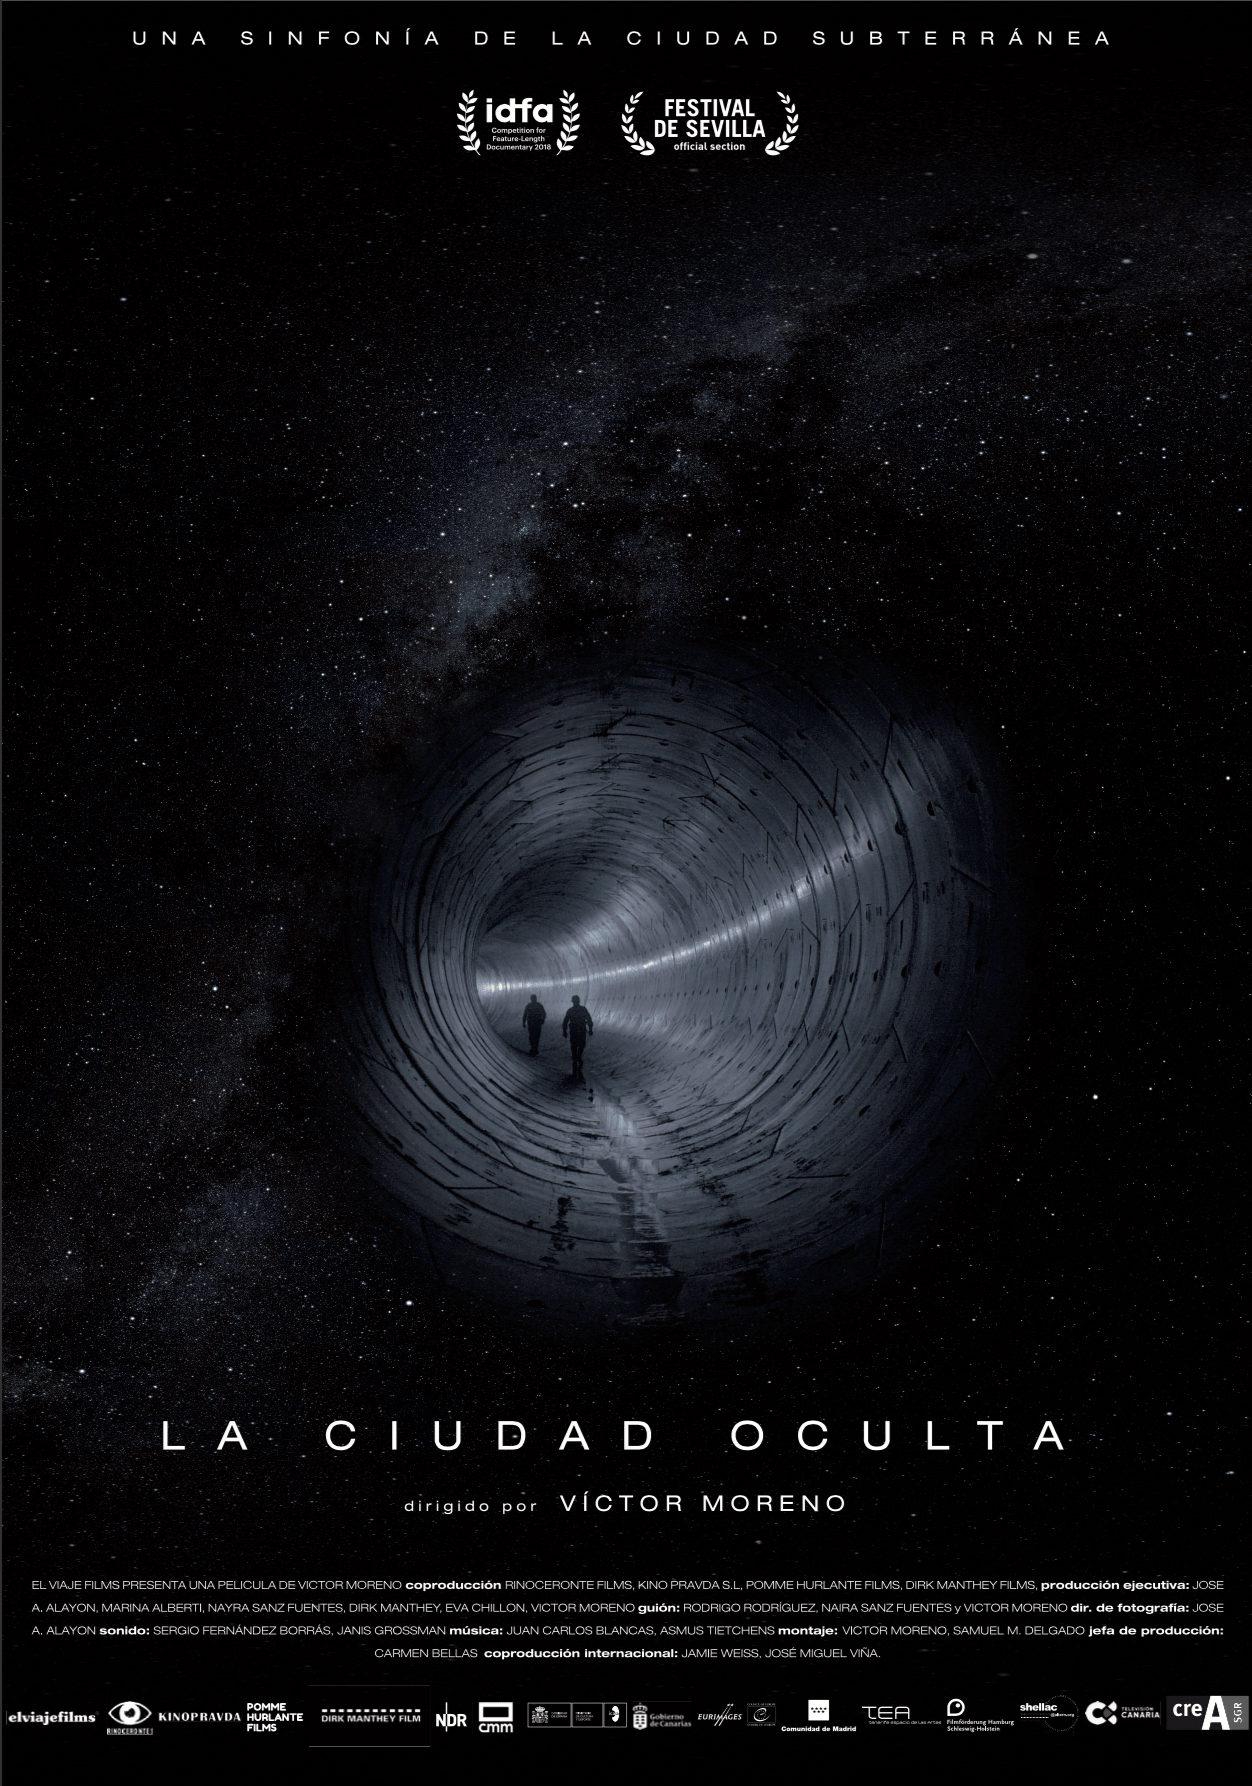 Pomme Hurlante Films - Catalog - The Hidden City - Victor Moreno